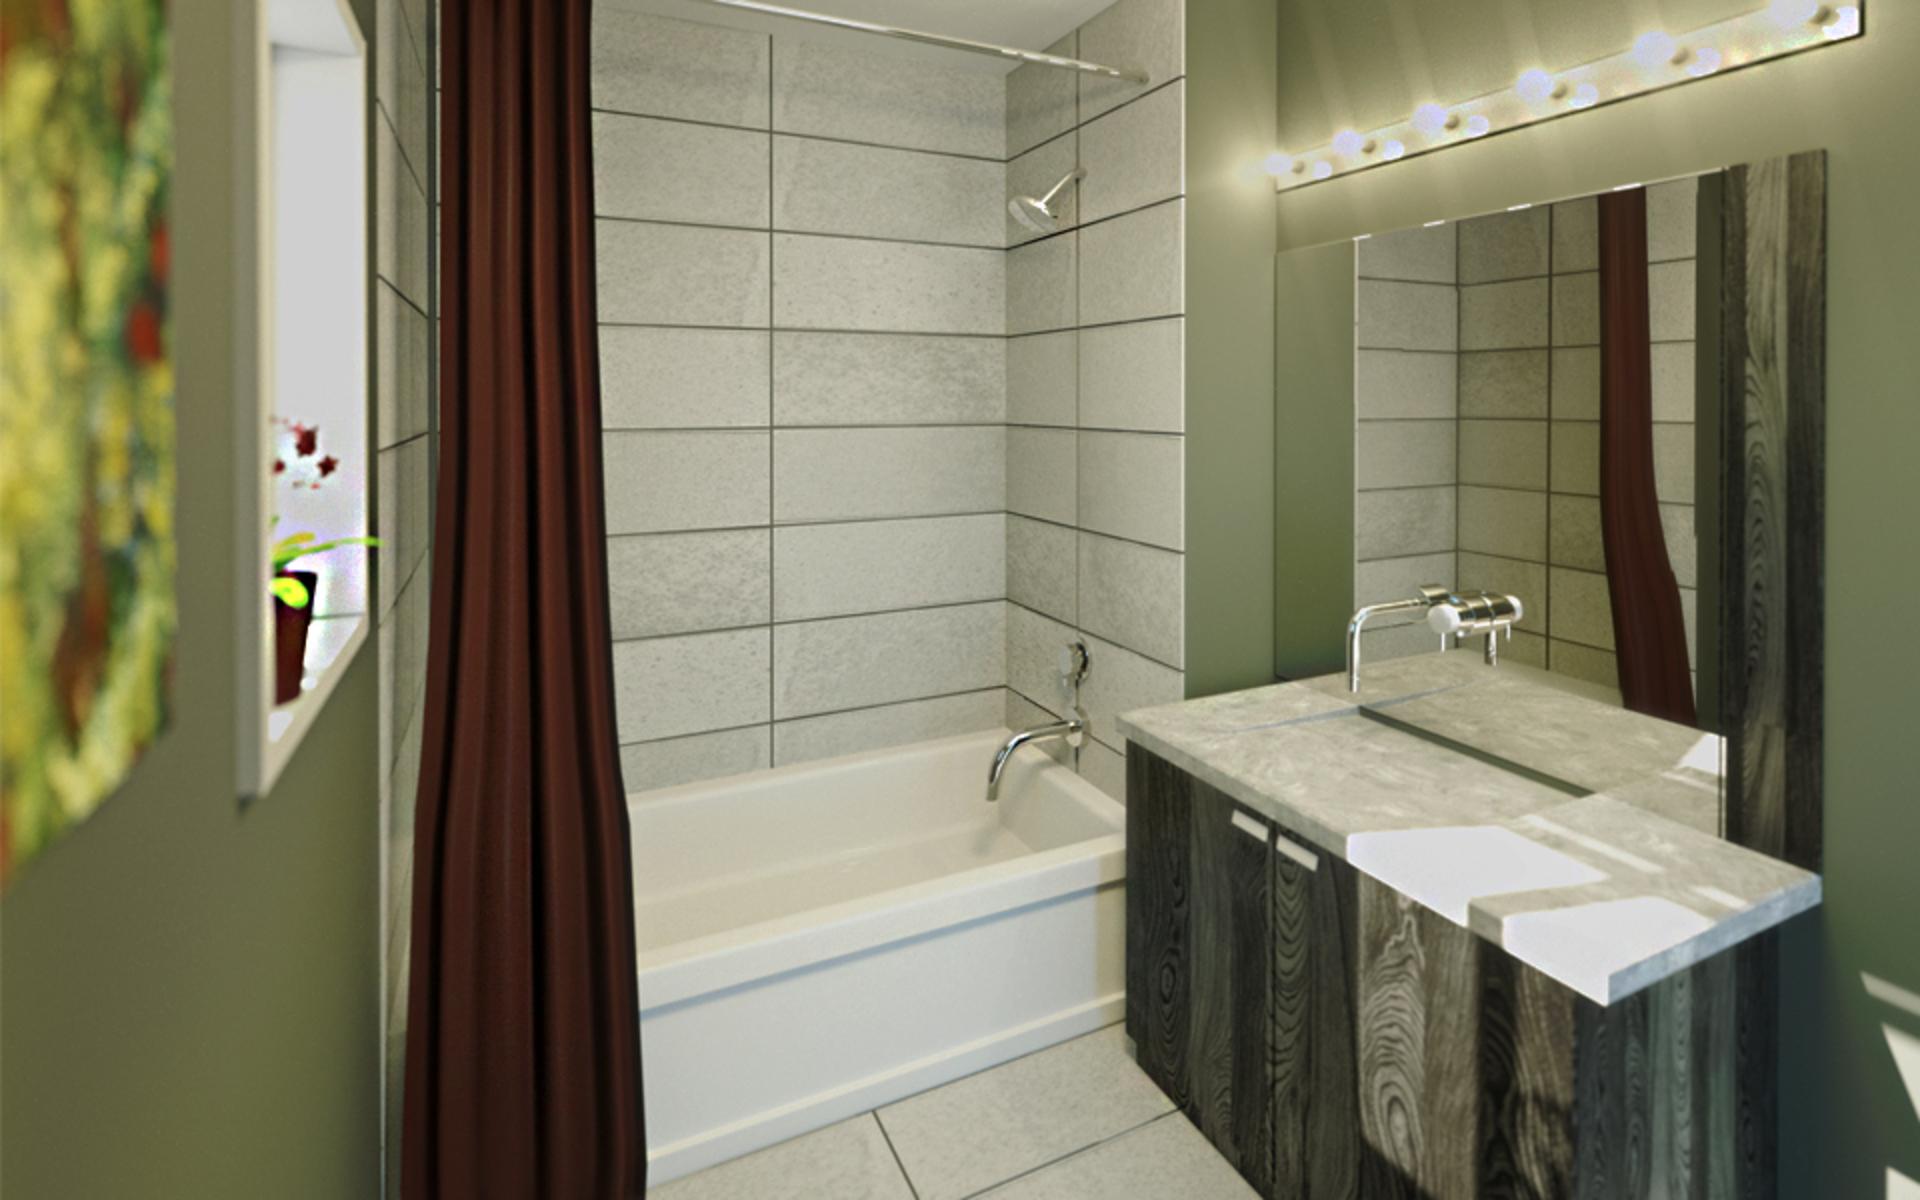 kensington-point-bathroom at Kensington Point (3939 Knight Street, Knight, Vancouver East)